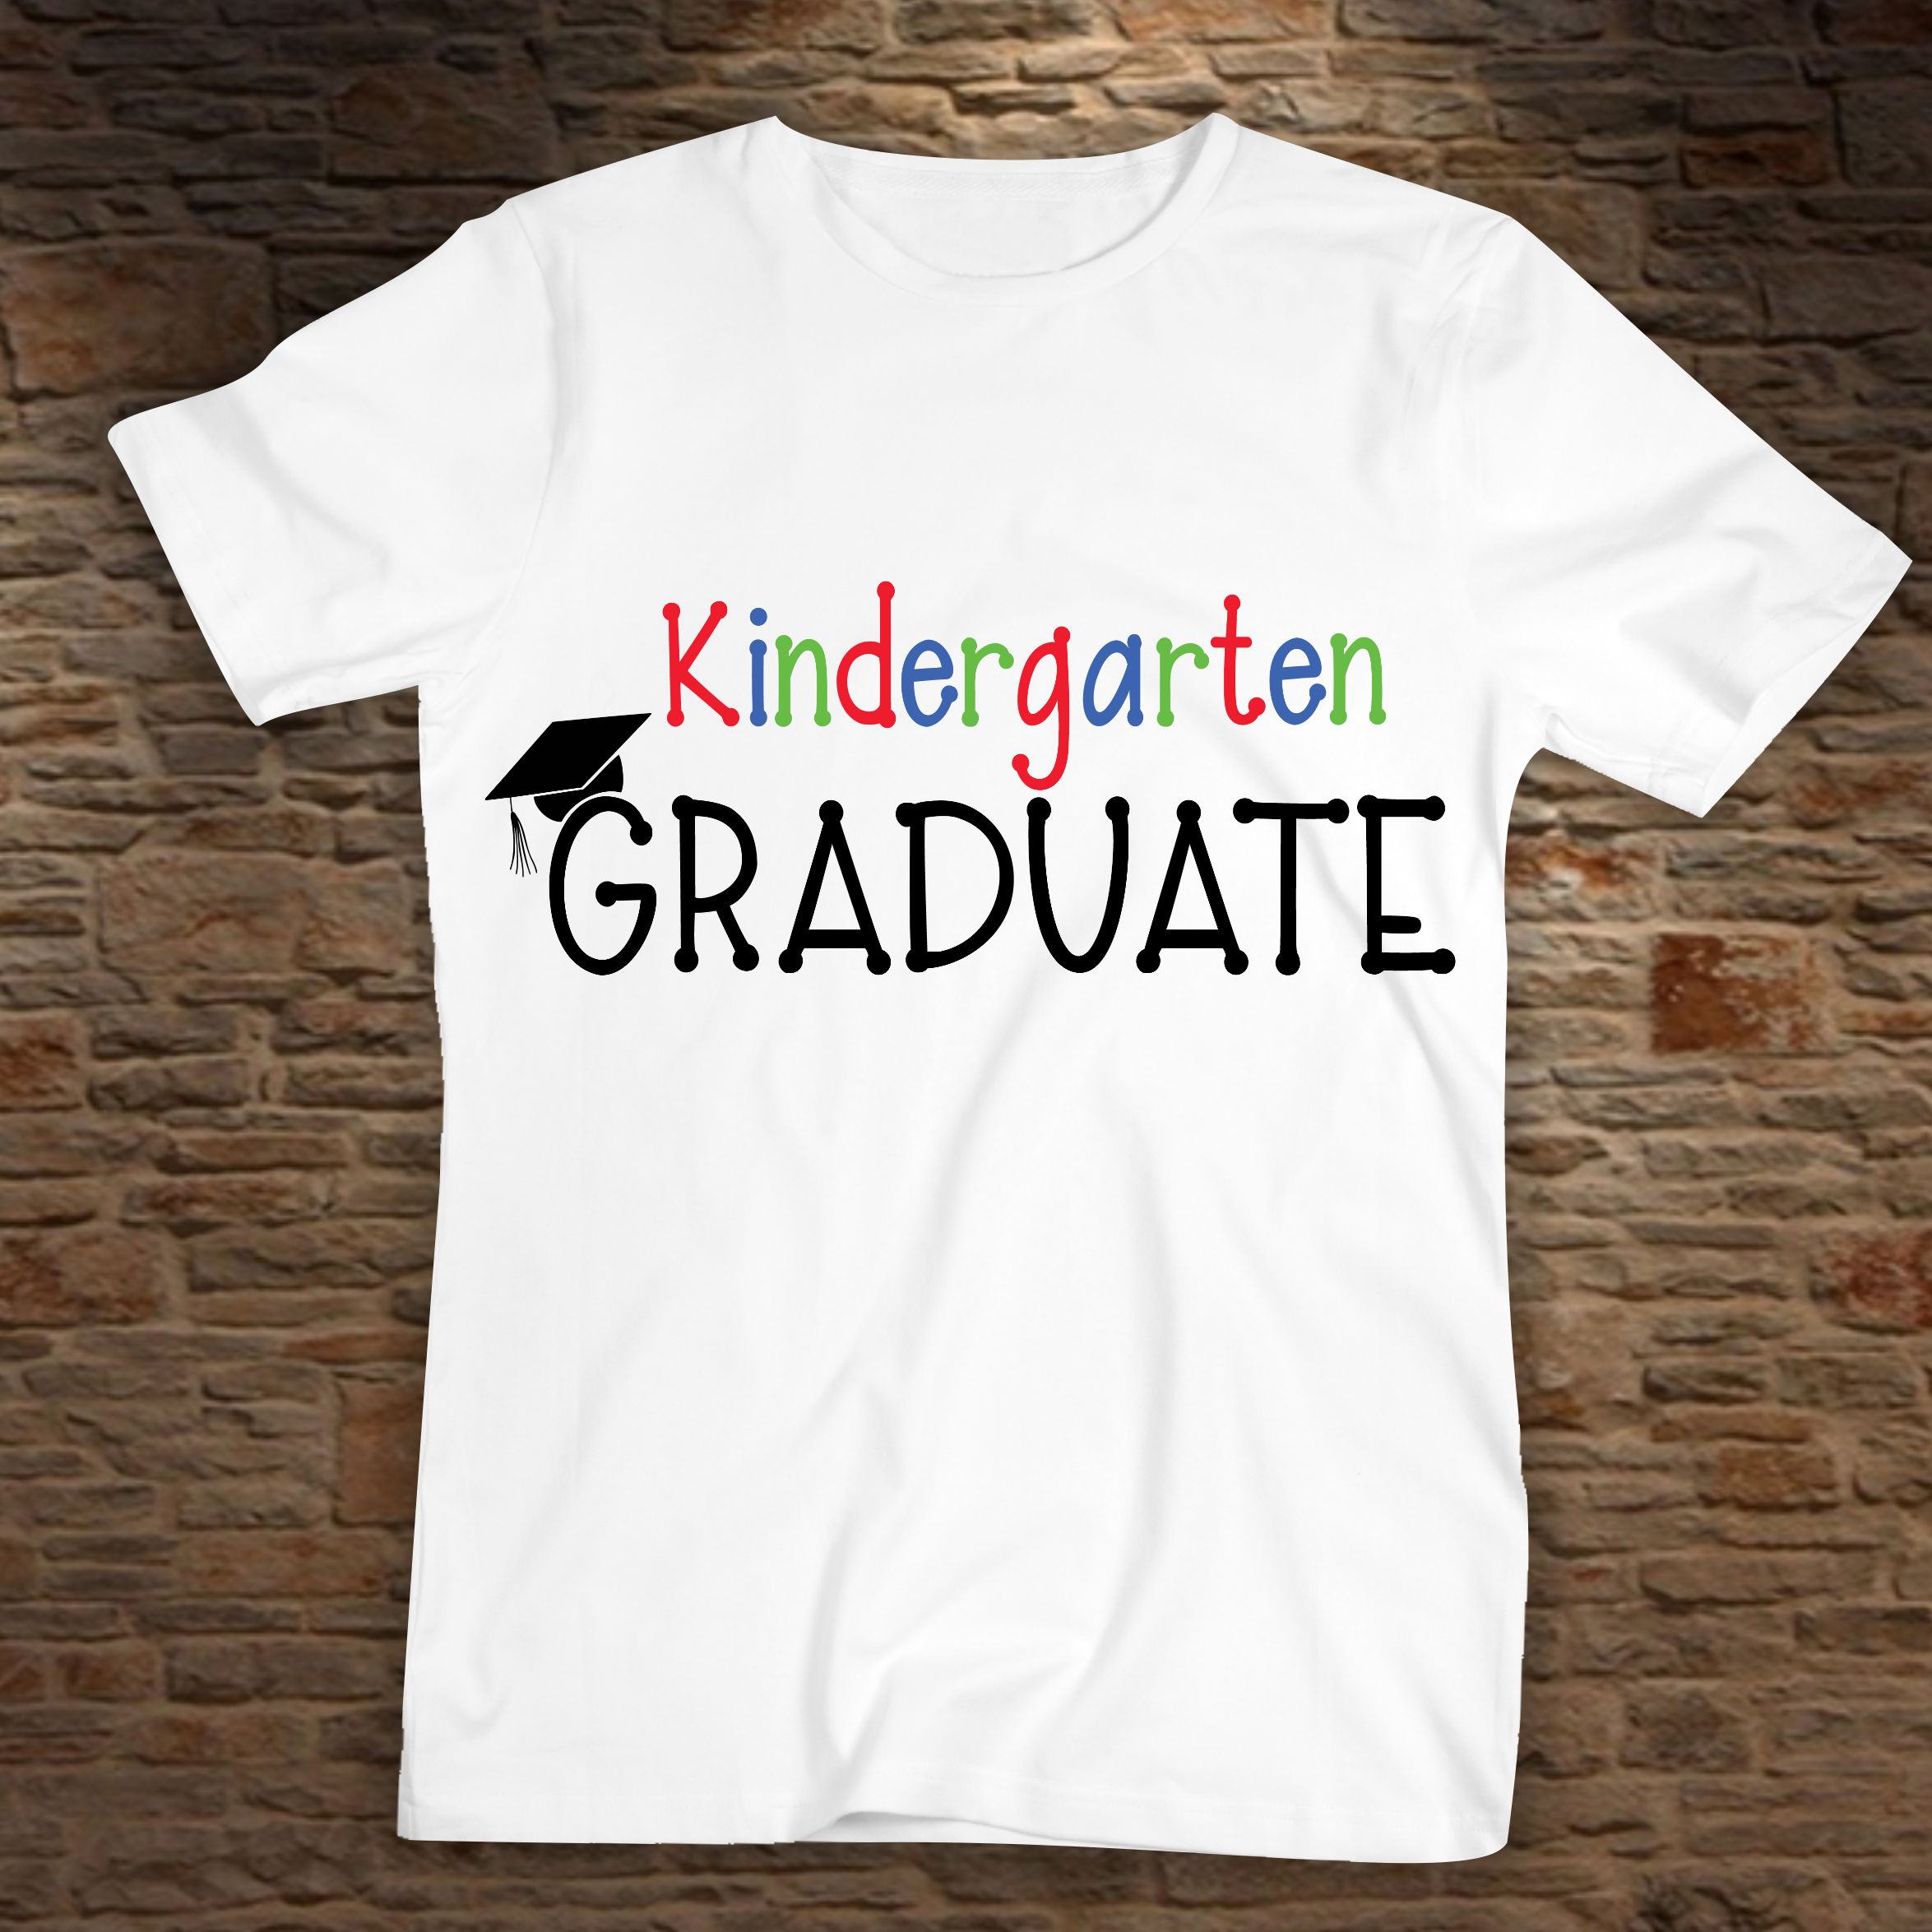 Kindergarten Graduate SVG - Graduation SVG example image 2